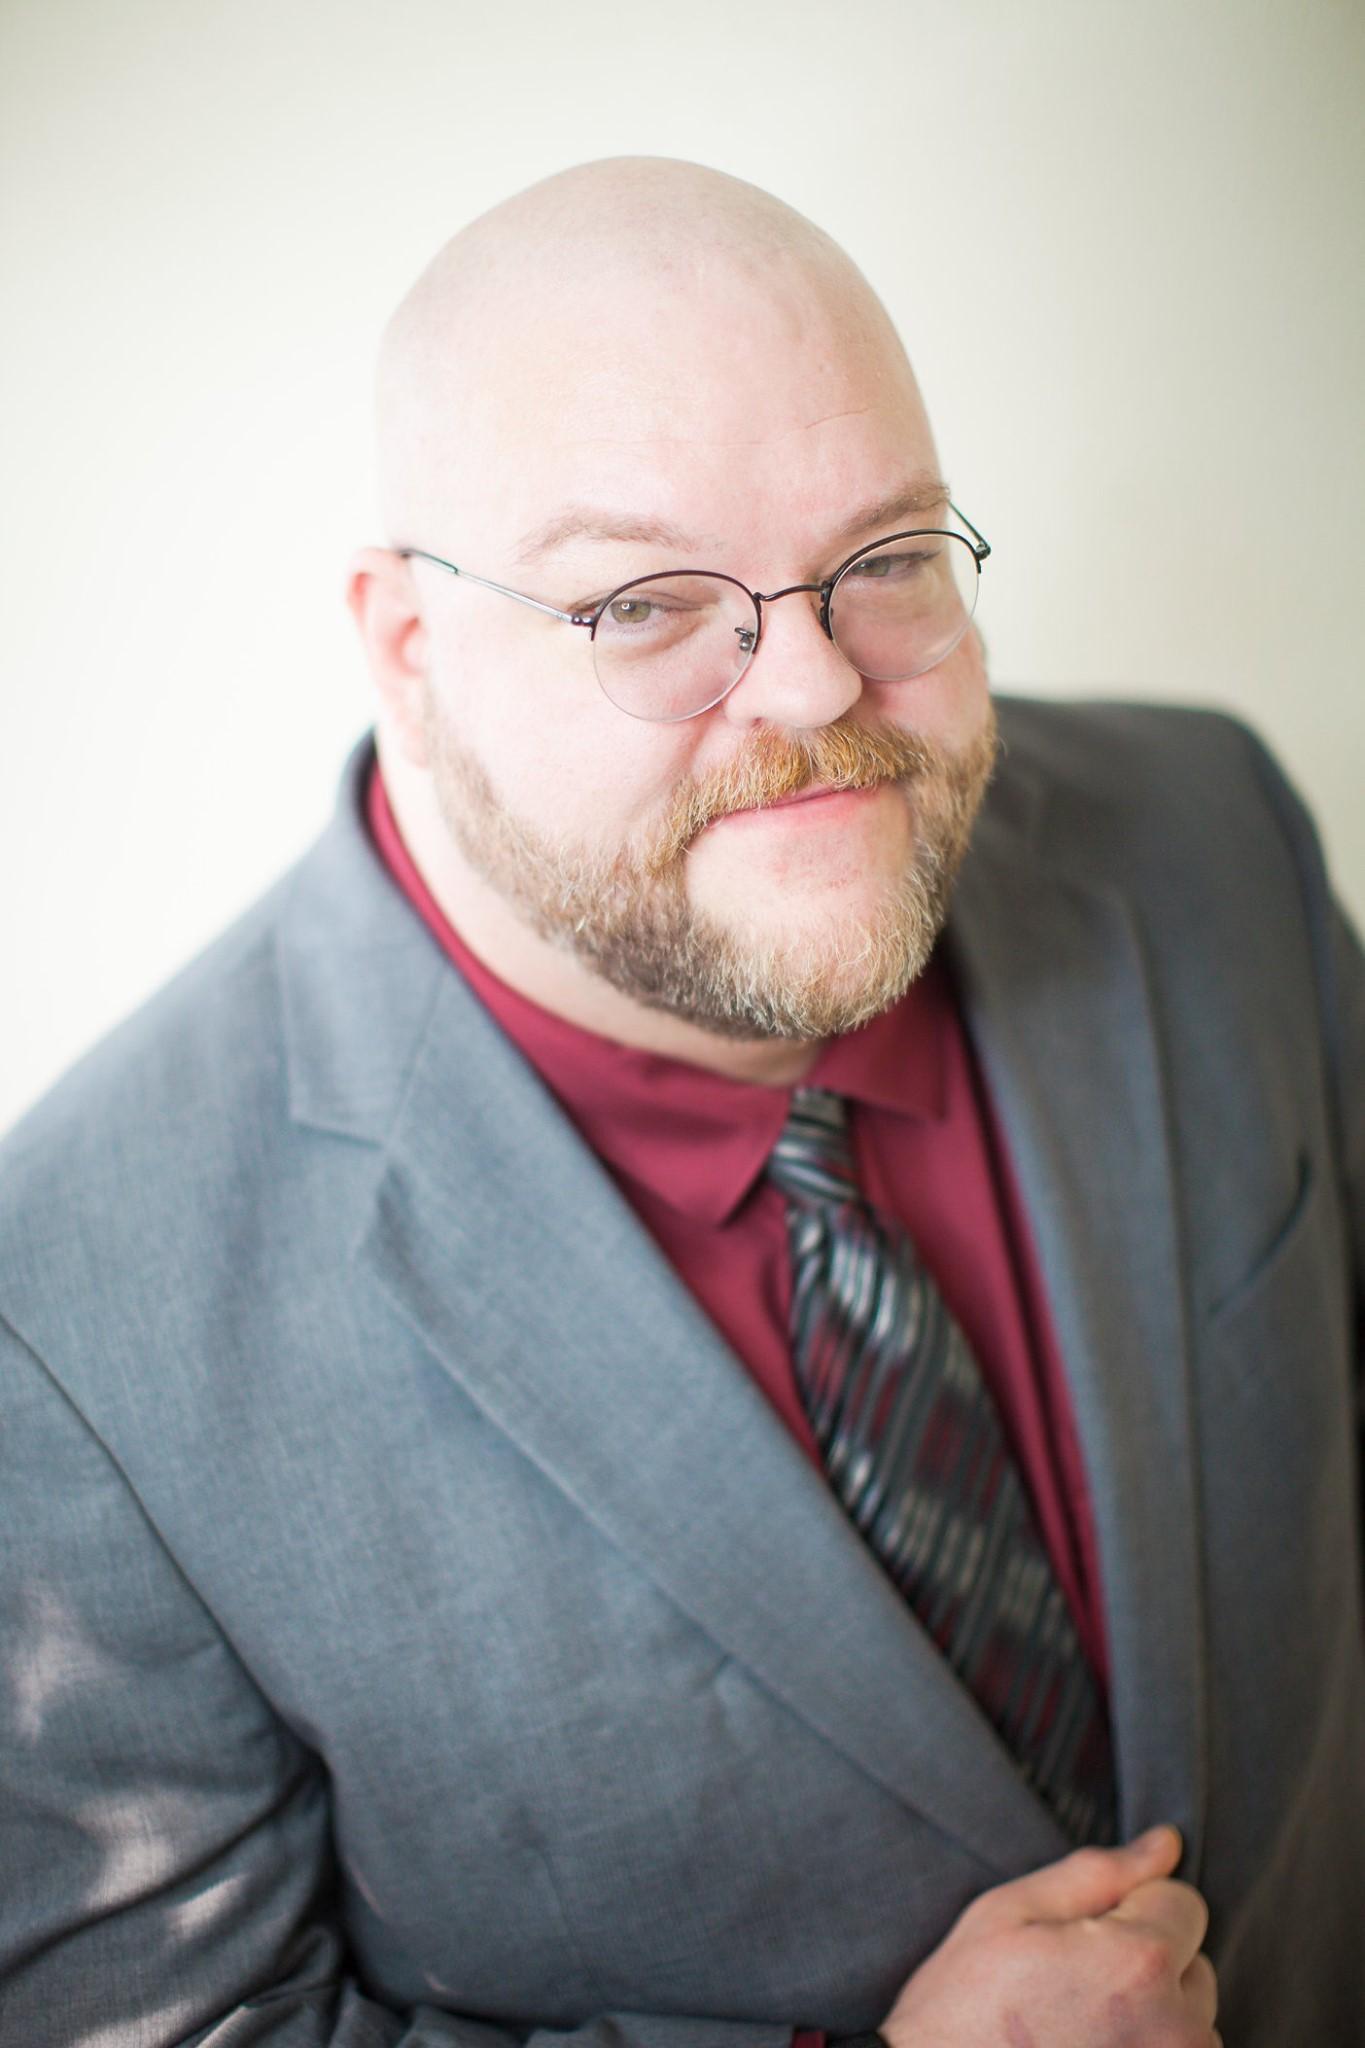 Brian Michael Pratt